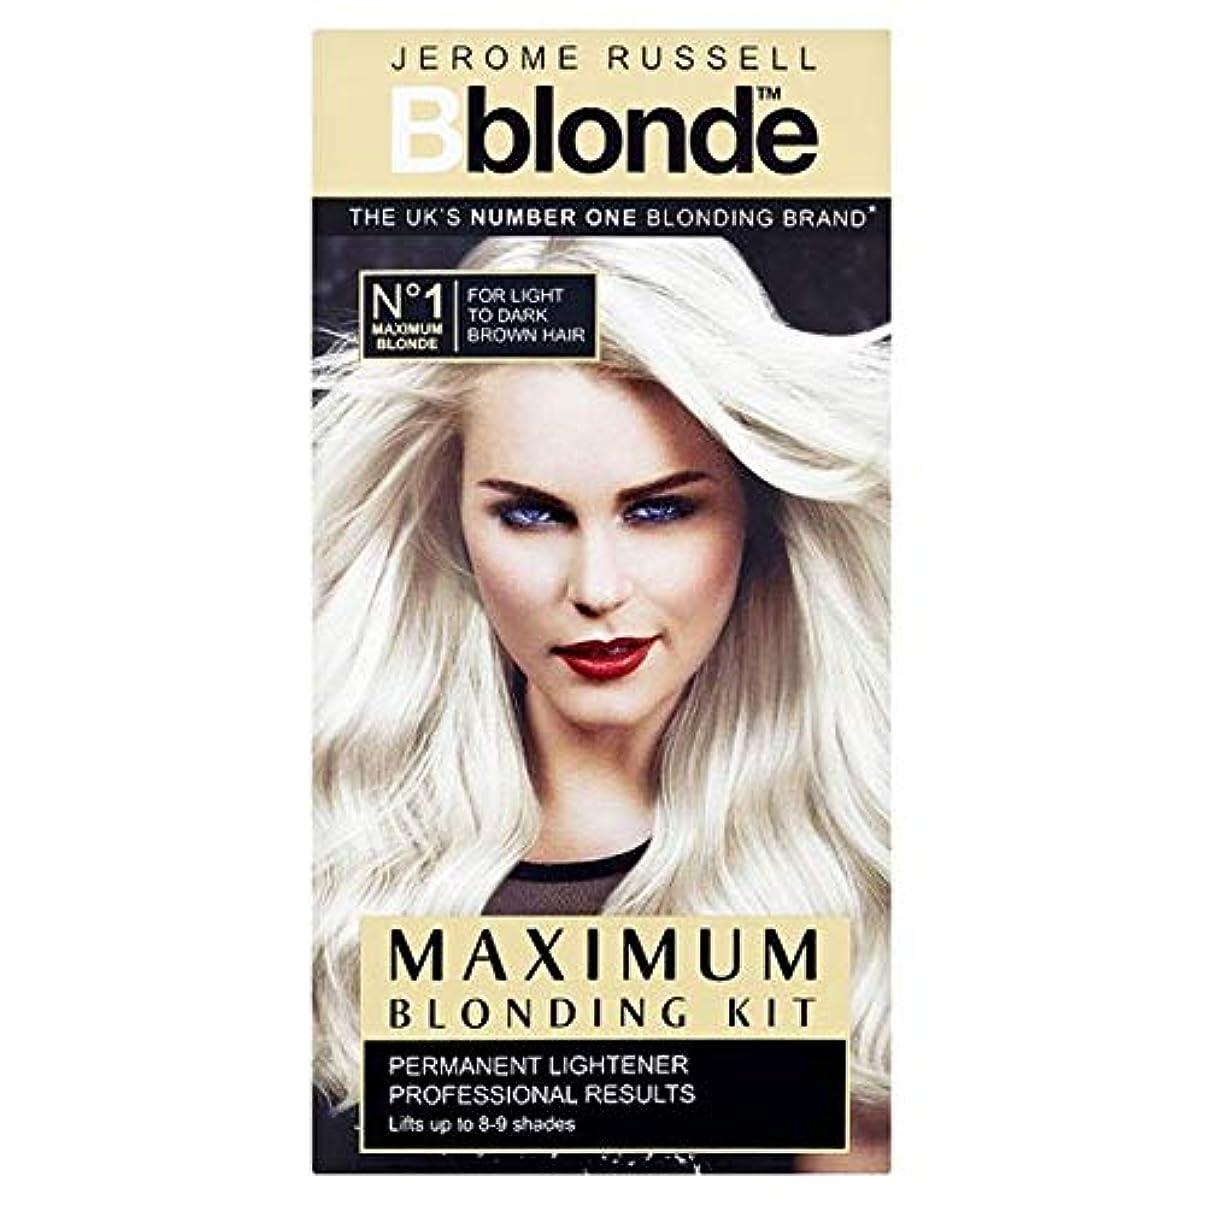 [Jerome Russell] ジェロームラッセルB金髪最大Blondingキット - Jerome Russell B Blonde Maximum Blonding Kit [並行輸入品]